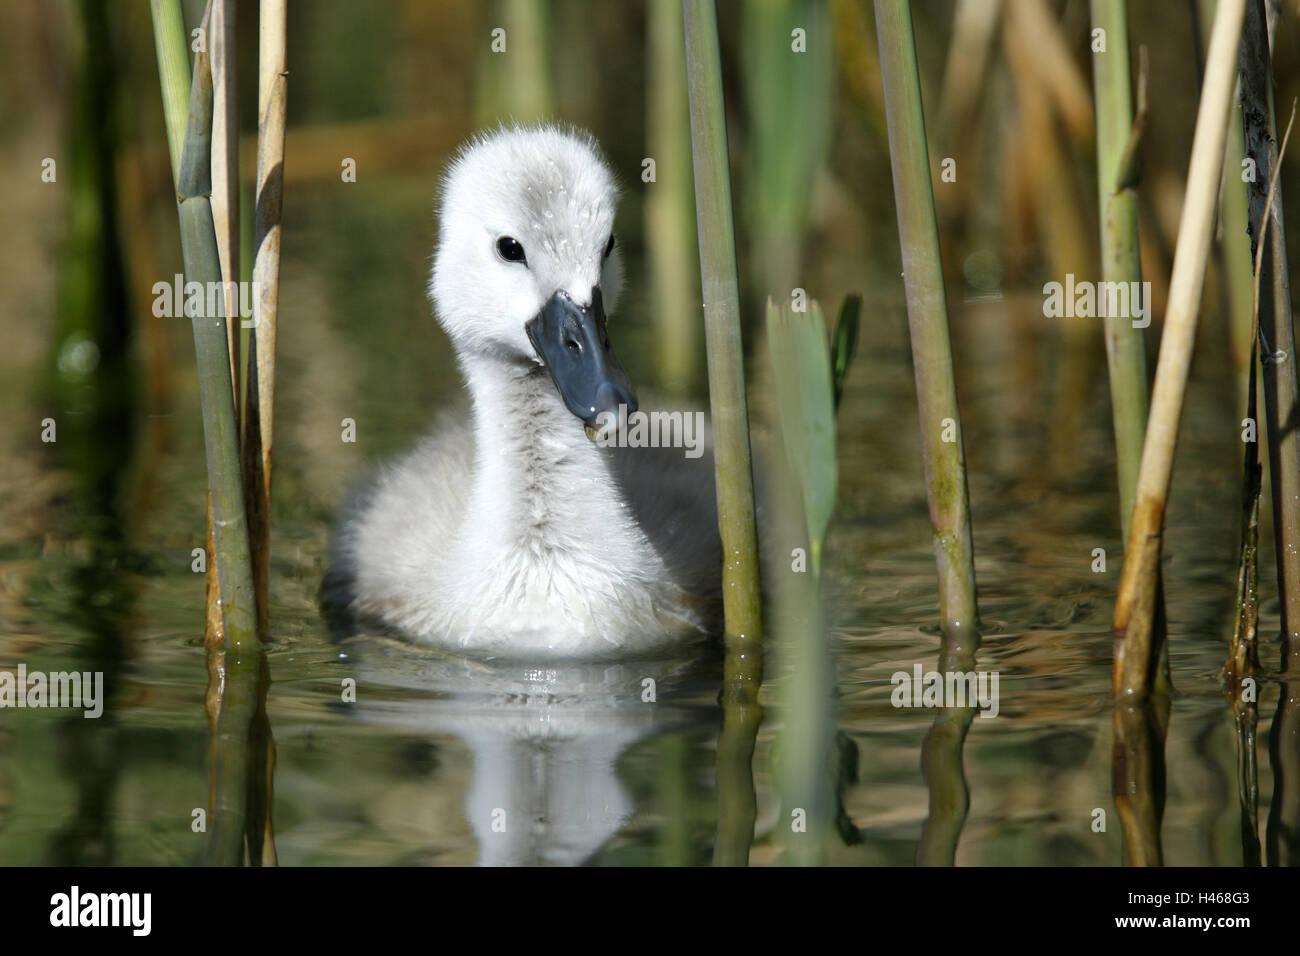 Pond, hump swan, Cygnus olor, fledglings, swim, pool, water, animal baby, animal, bird species, duck's birds, - Stock Image